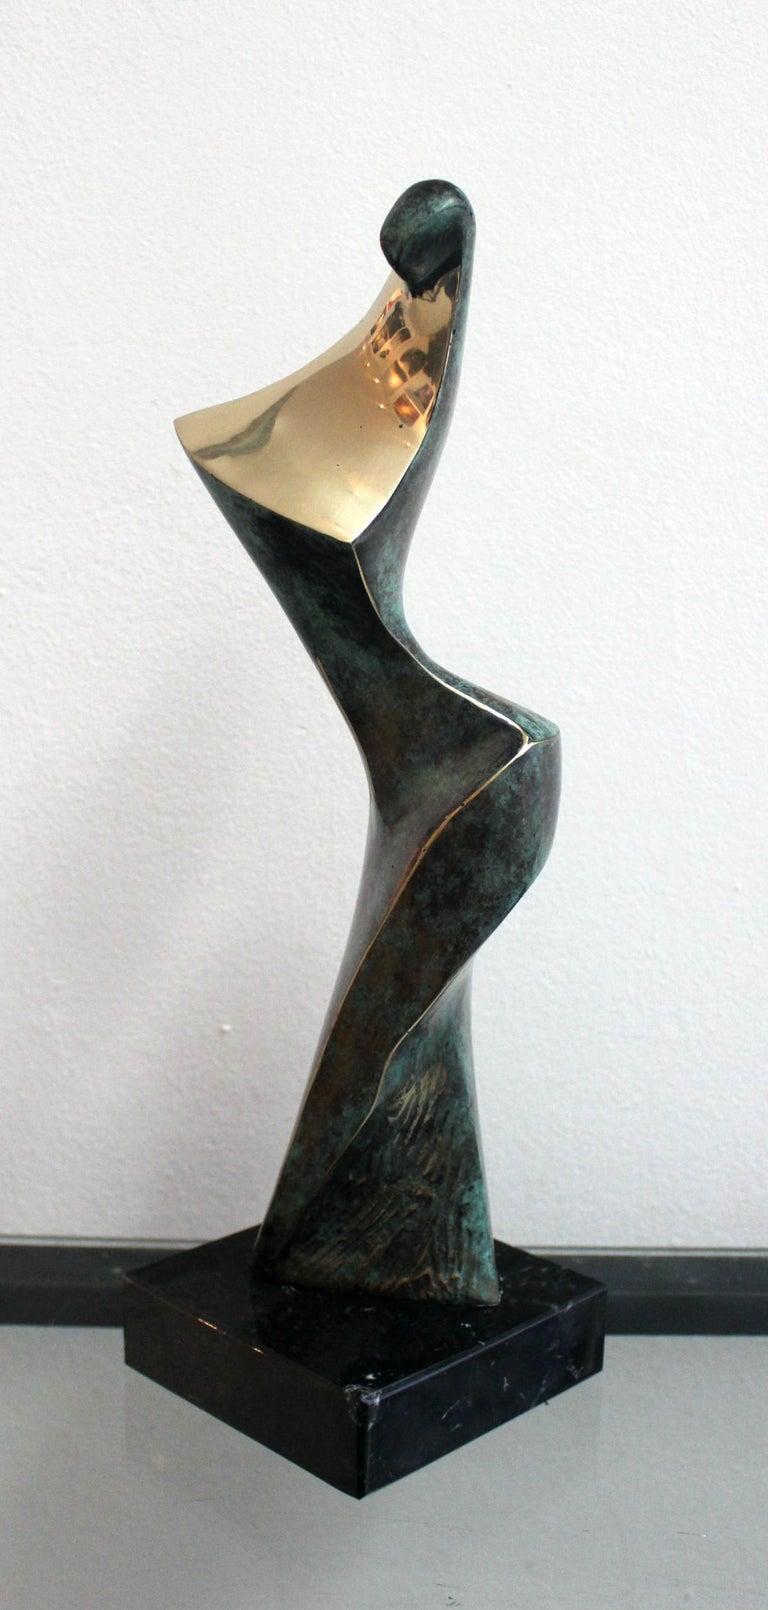 Dame - XXI Century, Contemporary Bronze Sculpture, Figurative, Nude, Abstraction - Gold Nude Sculpture by Stanisław Wysocki